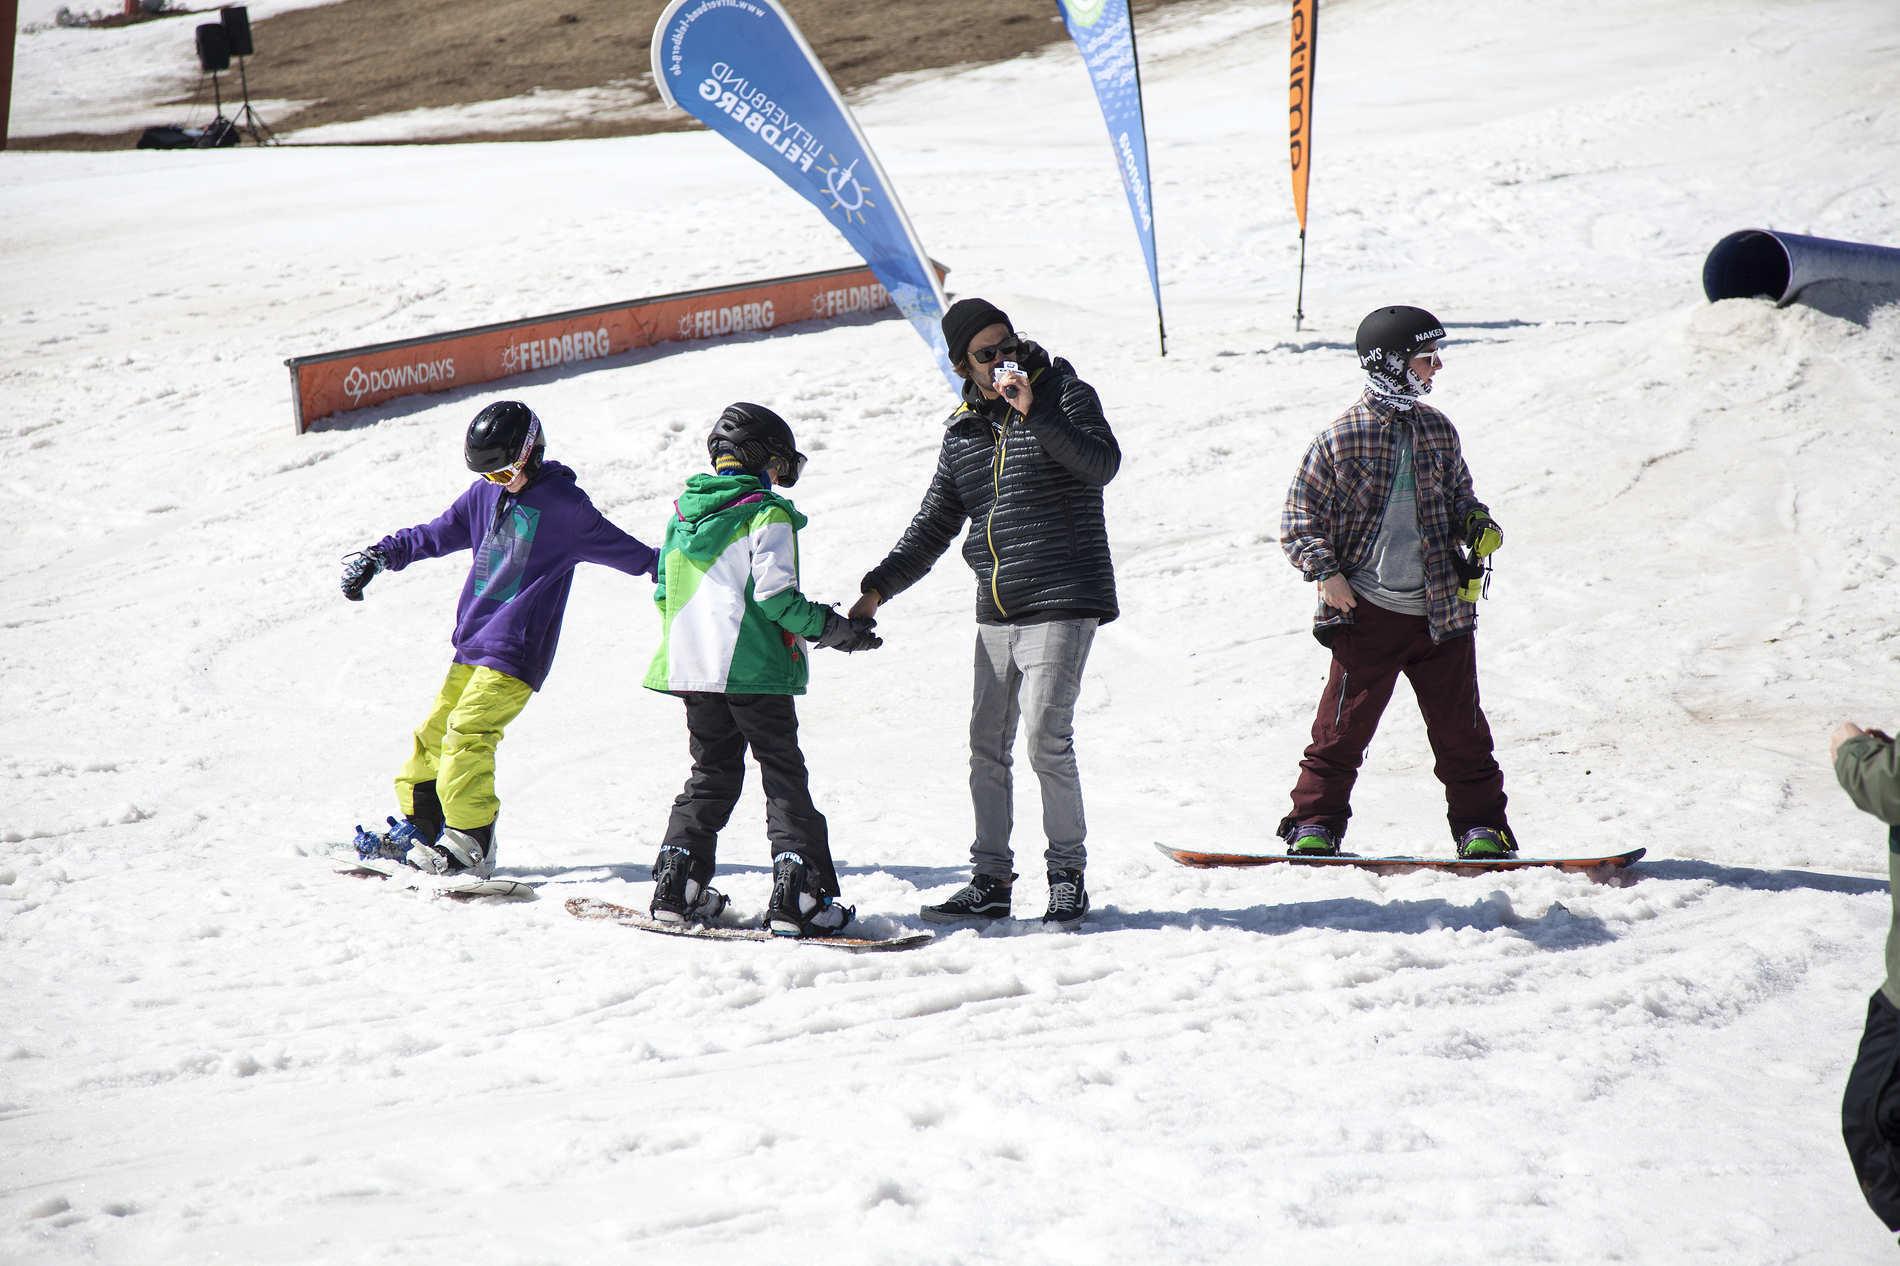 web snowpark feldberg 25 03 2017 lifestyle fs sb martin herrmann qparks 1